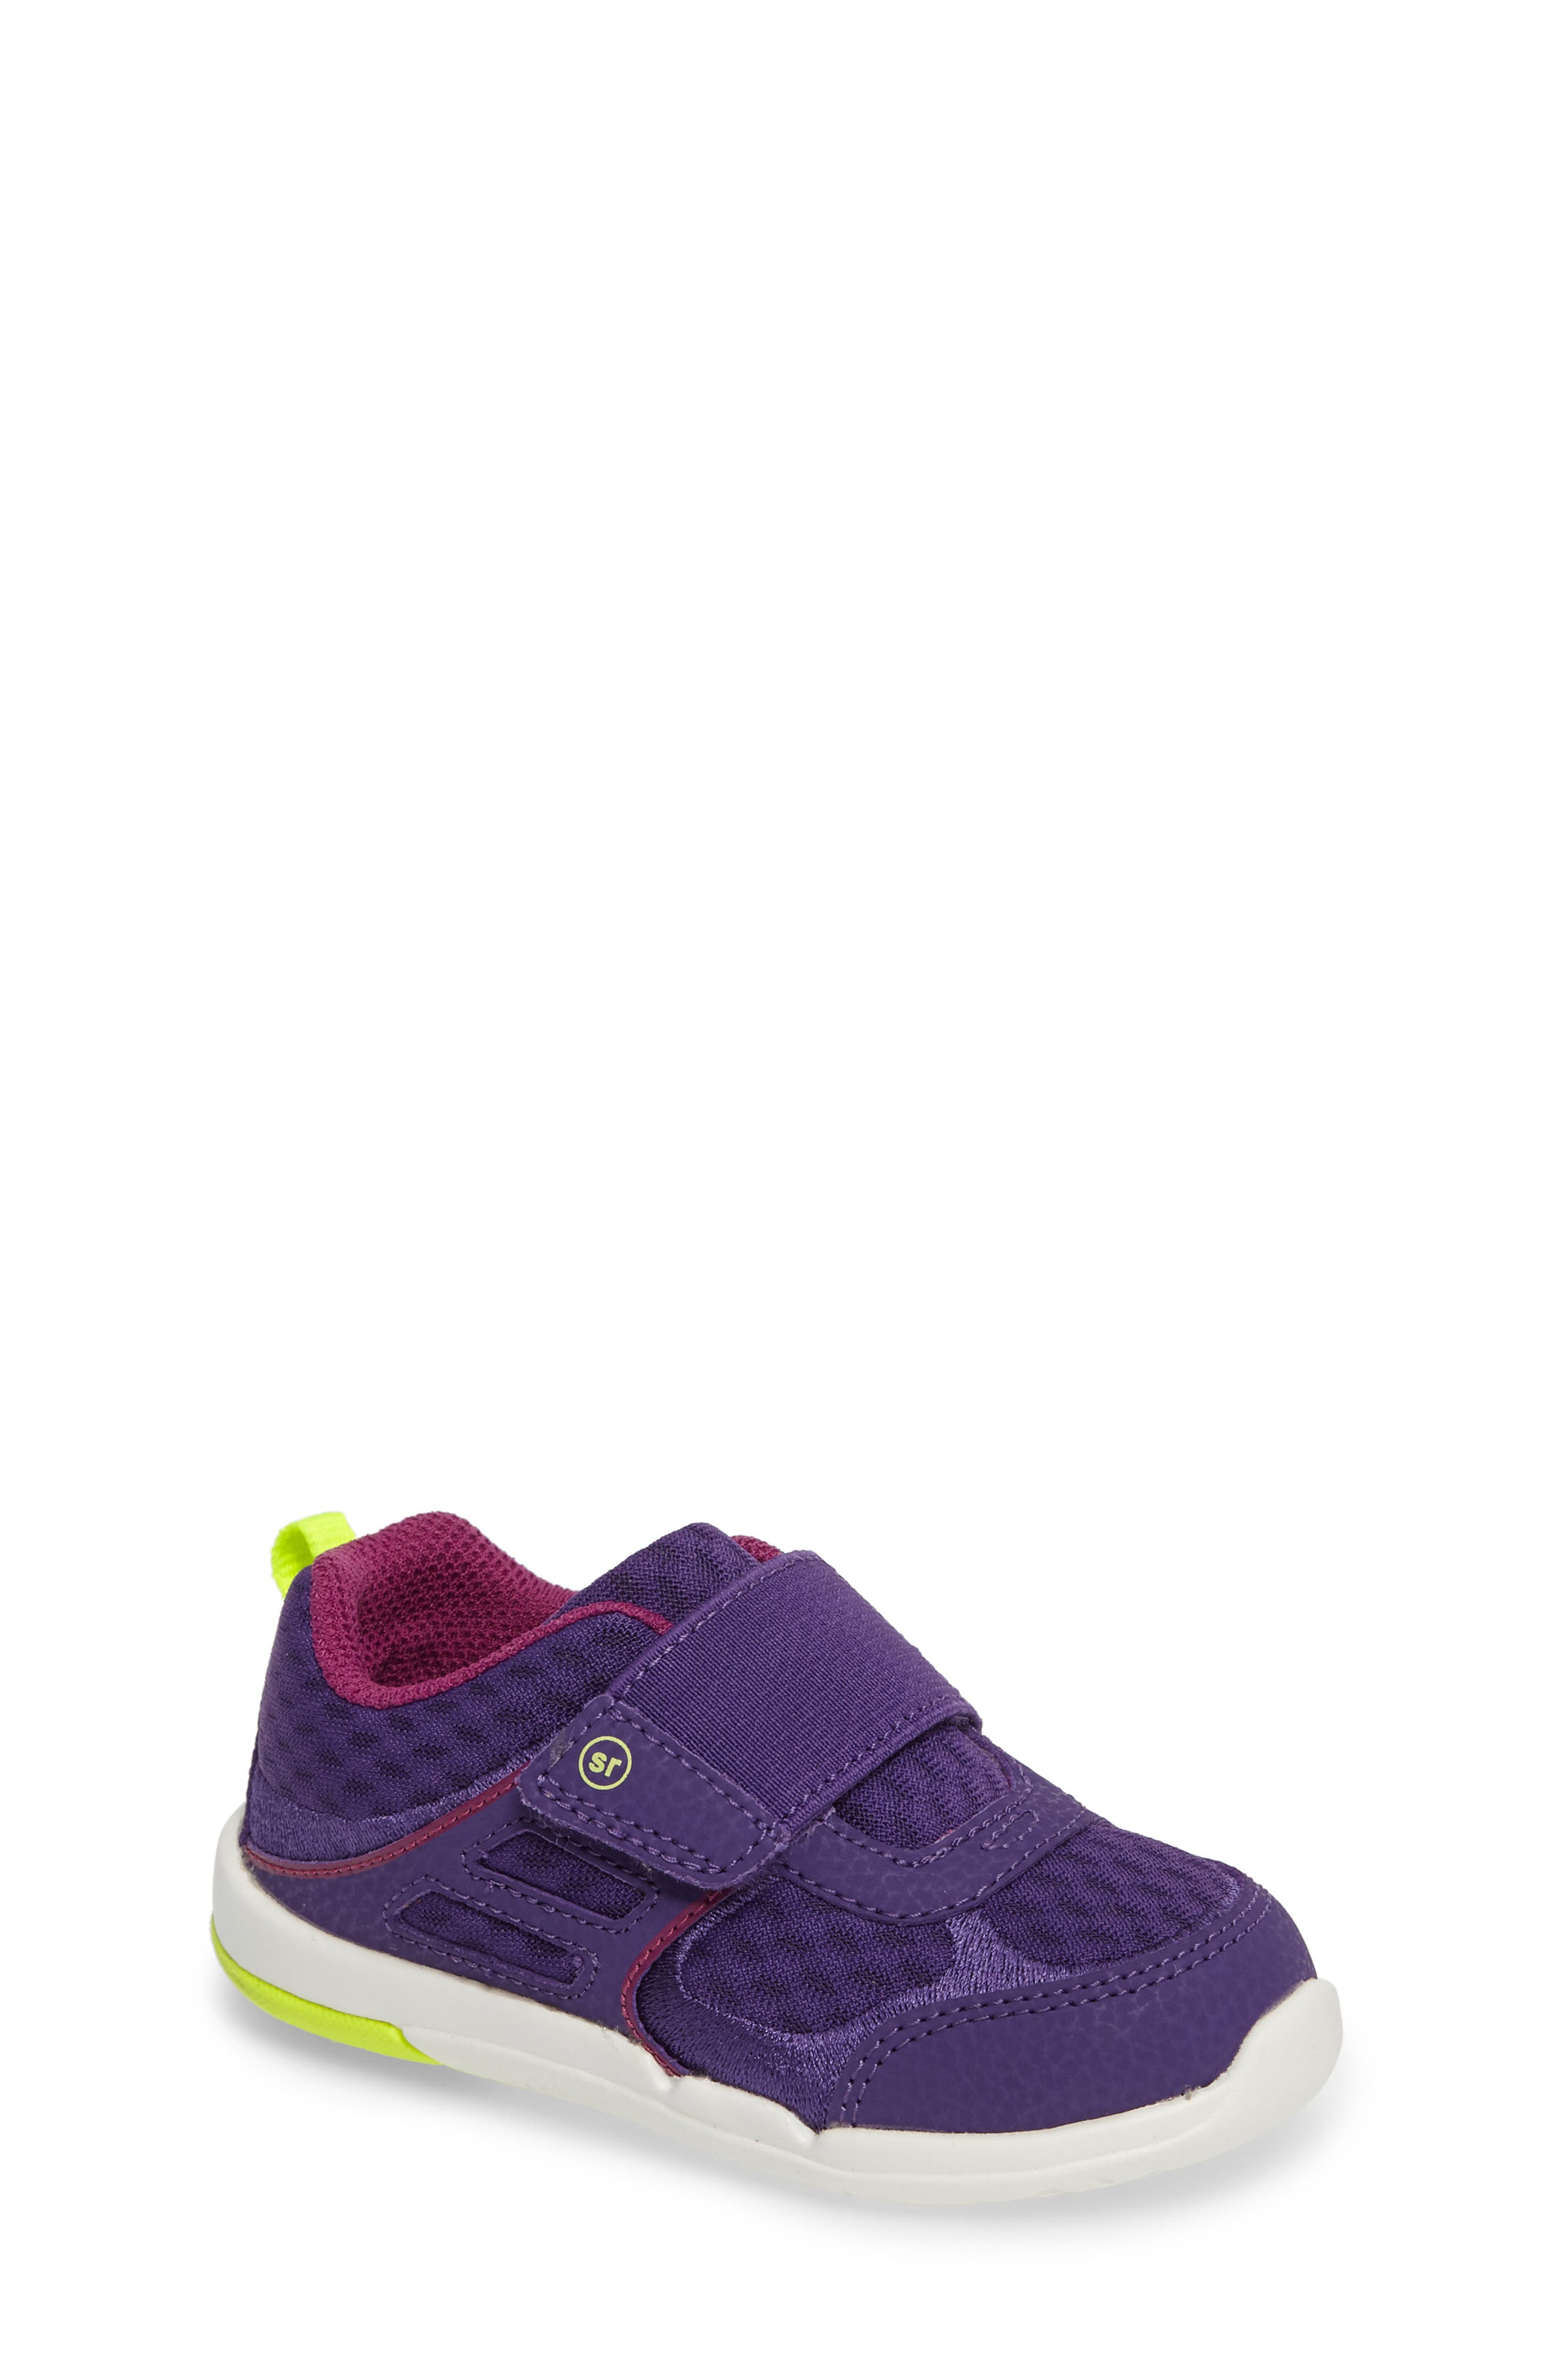 Casey Sneaker,                             Main thumbnail 1, color,                             500